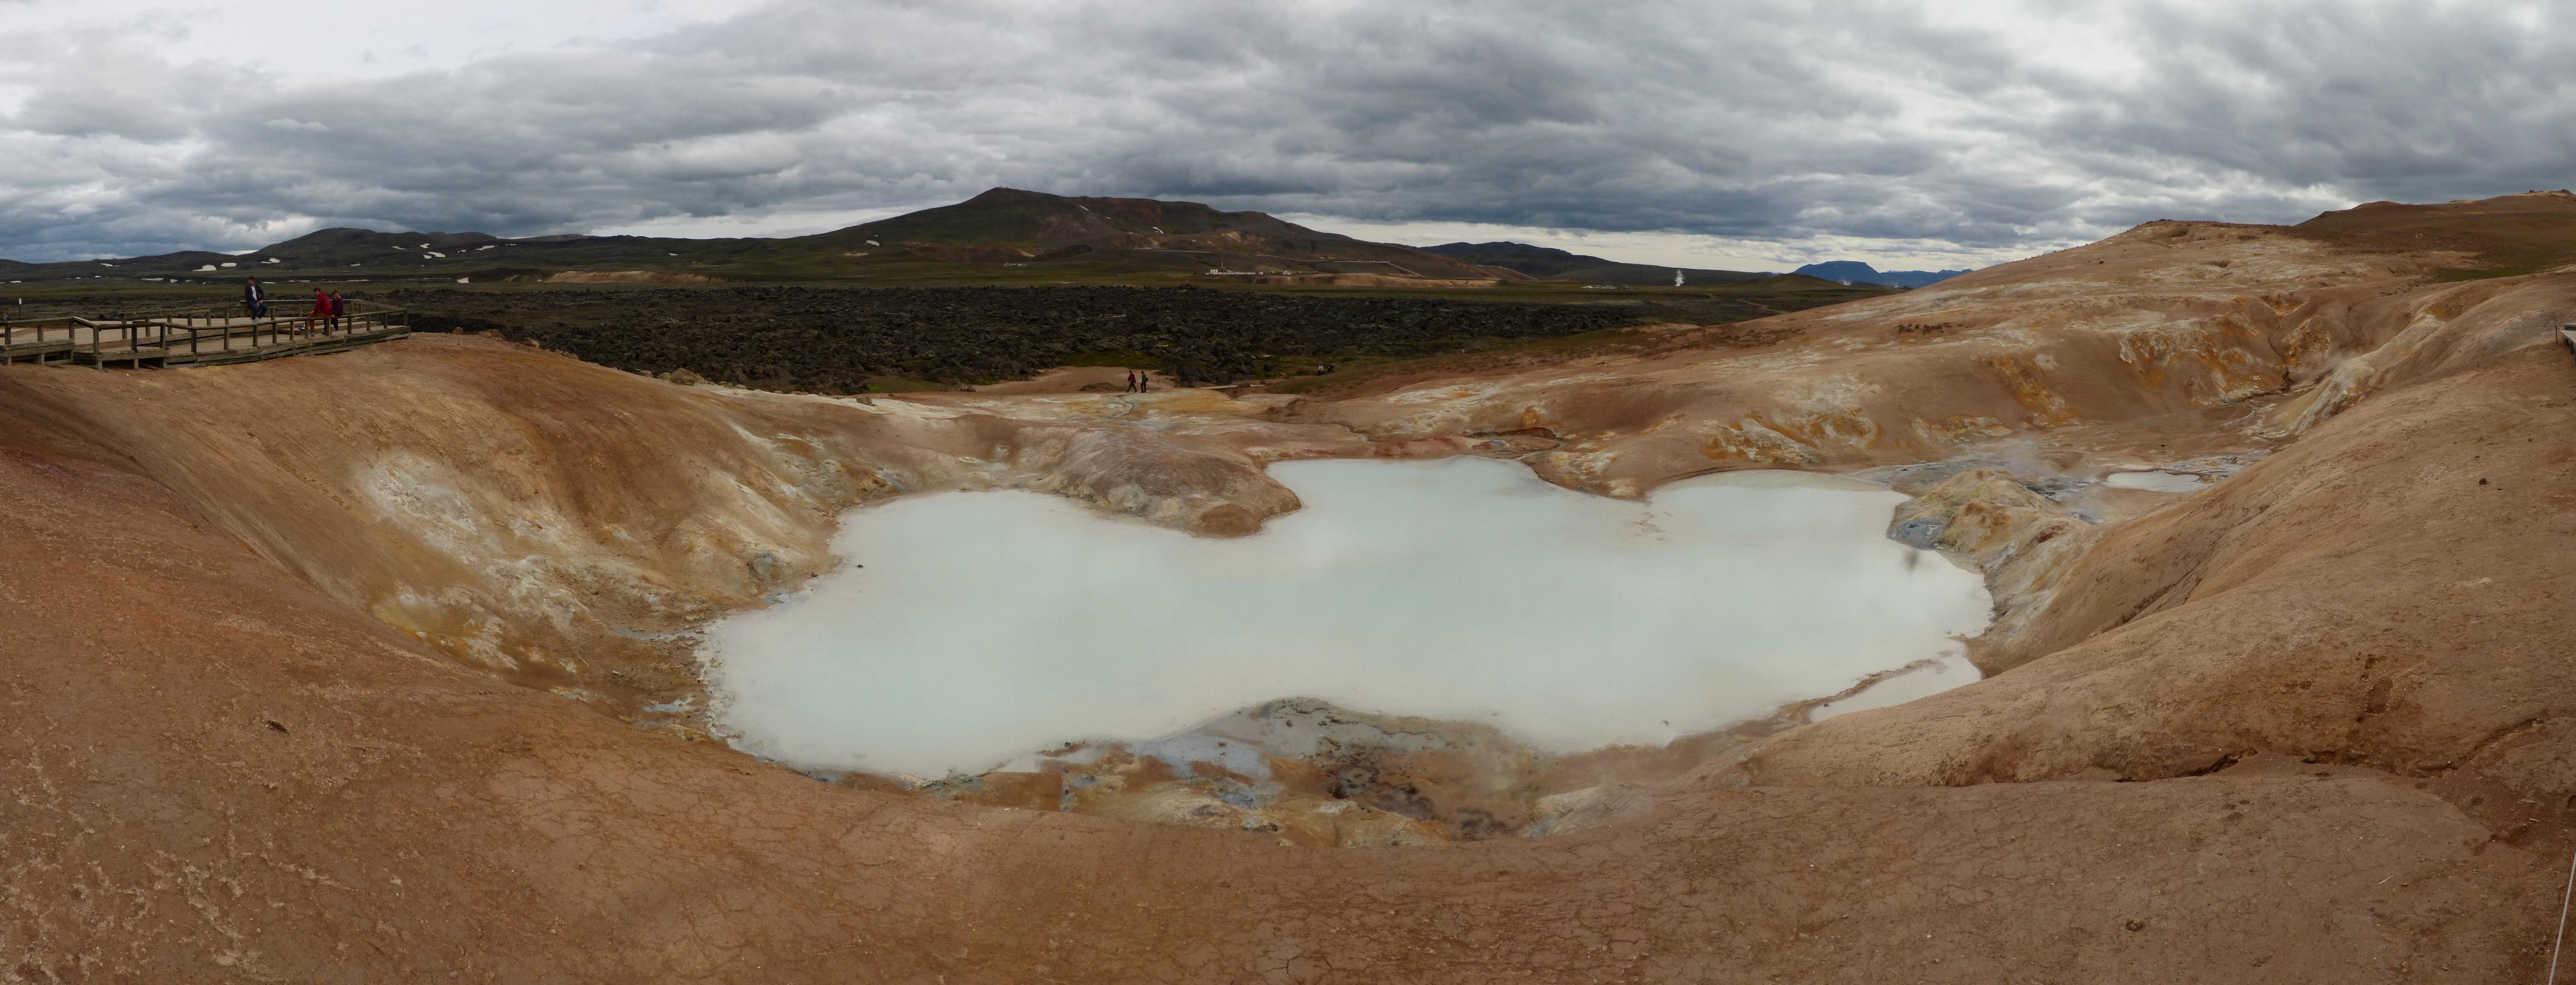 Panorama_14.JPG